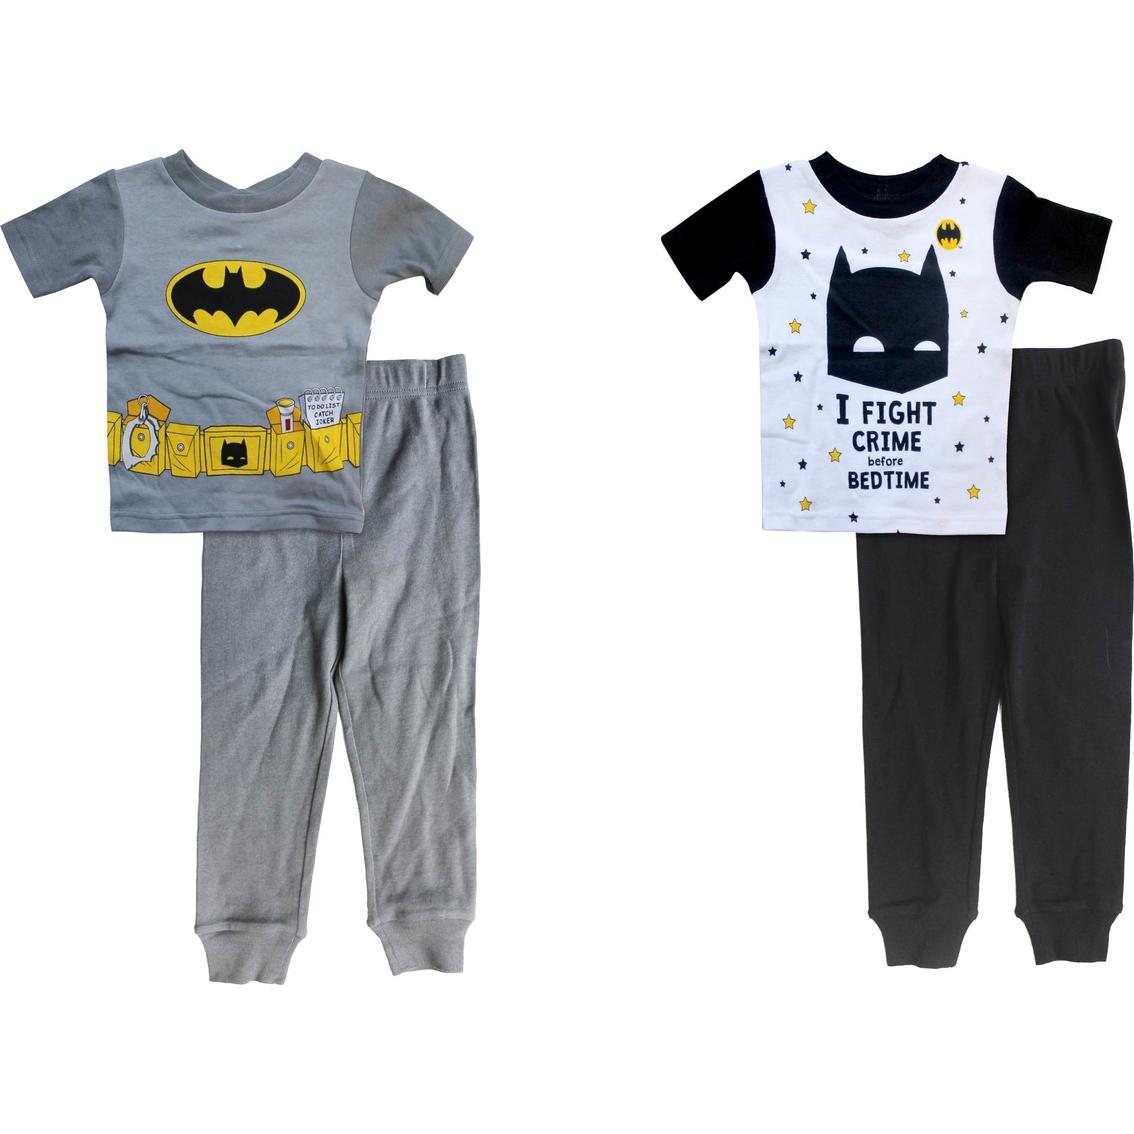 JOKER-DC COMICS-MEN /'S 2 Piece Pajama Set